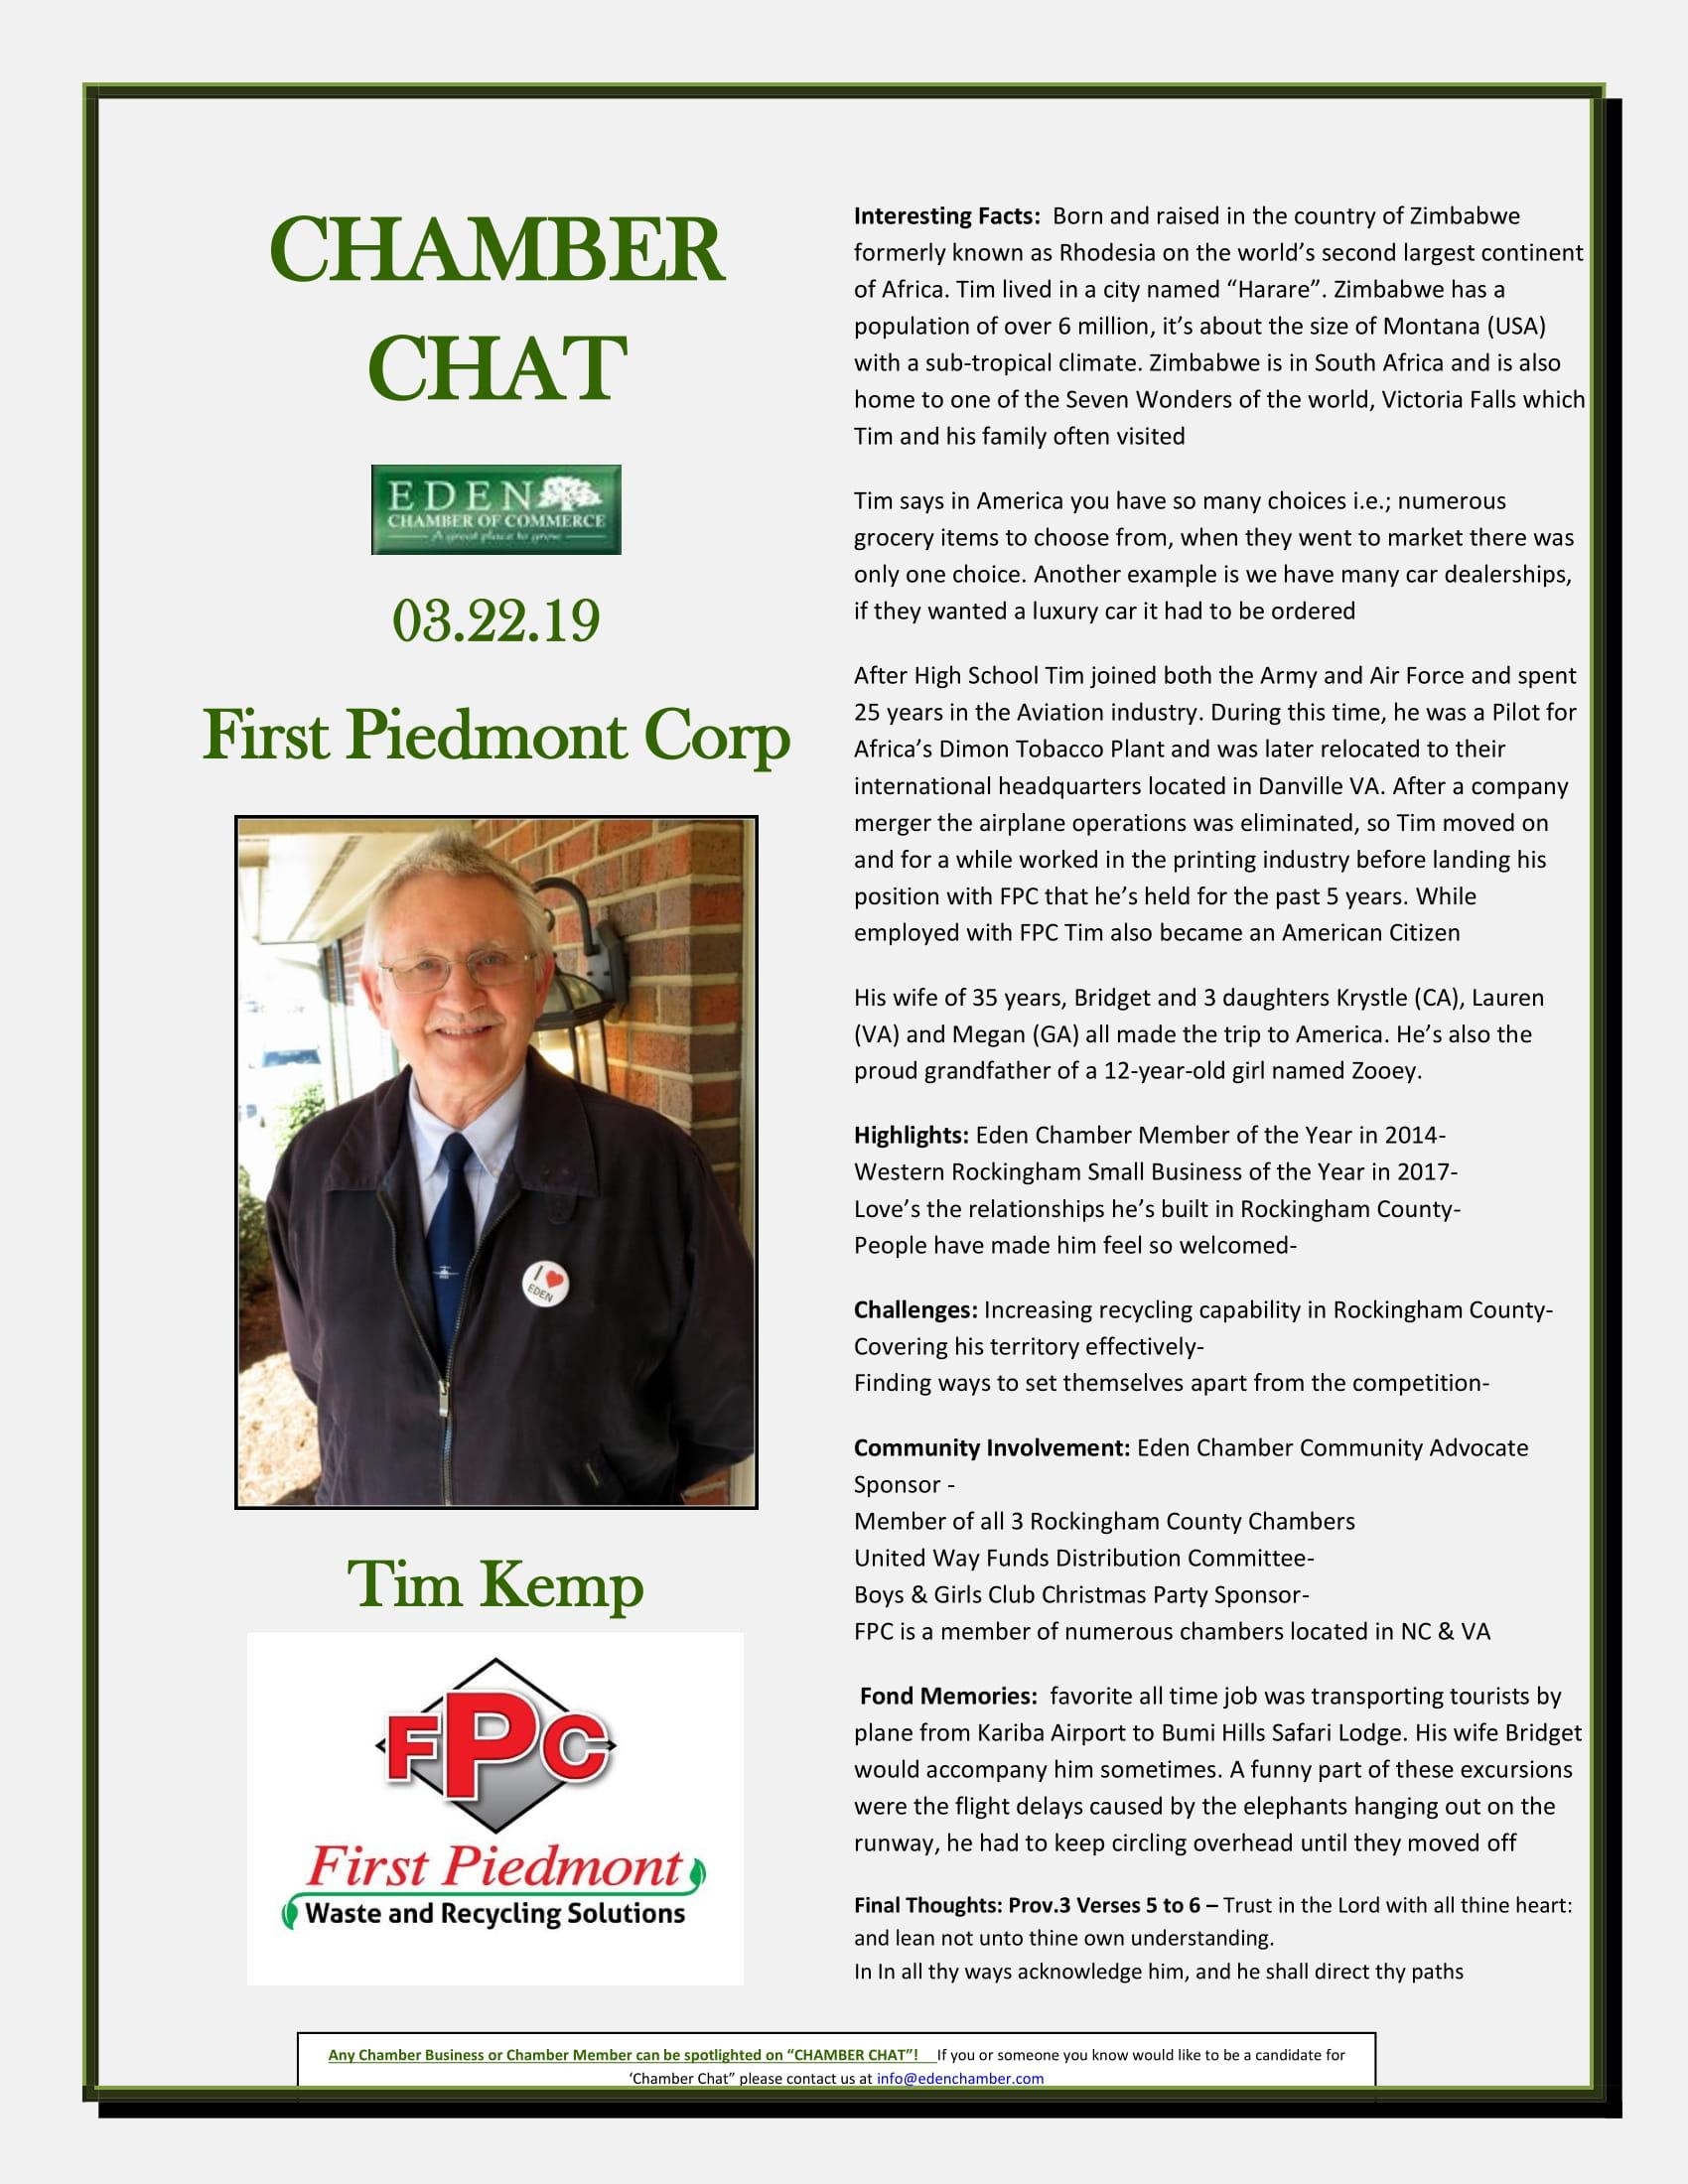 CHAMBER-CHAT-Tim-Kemp--FPC-1